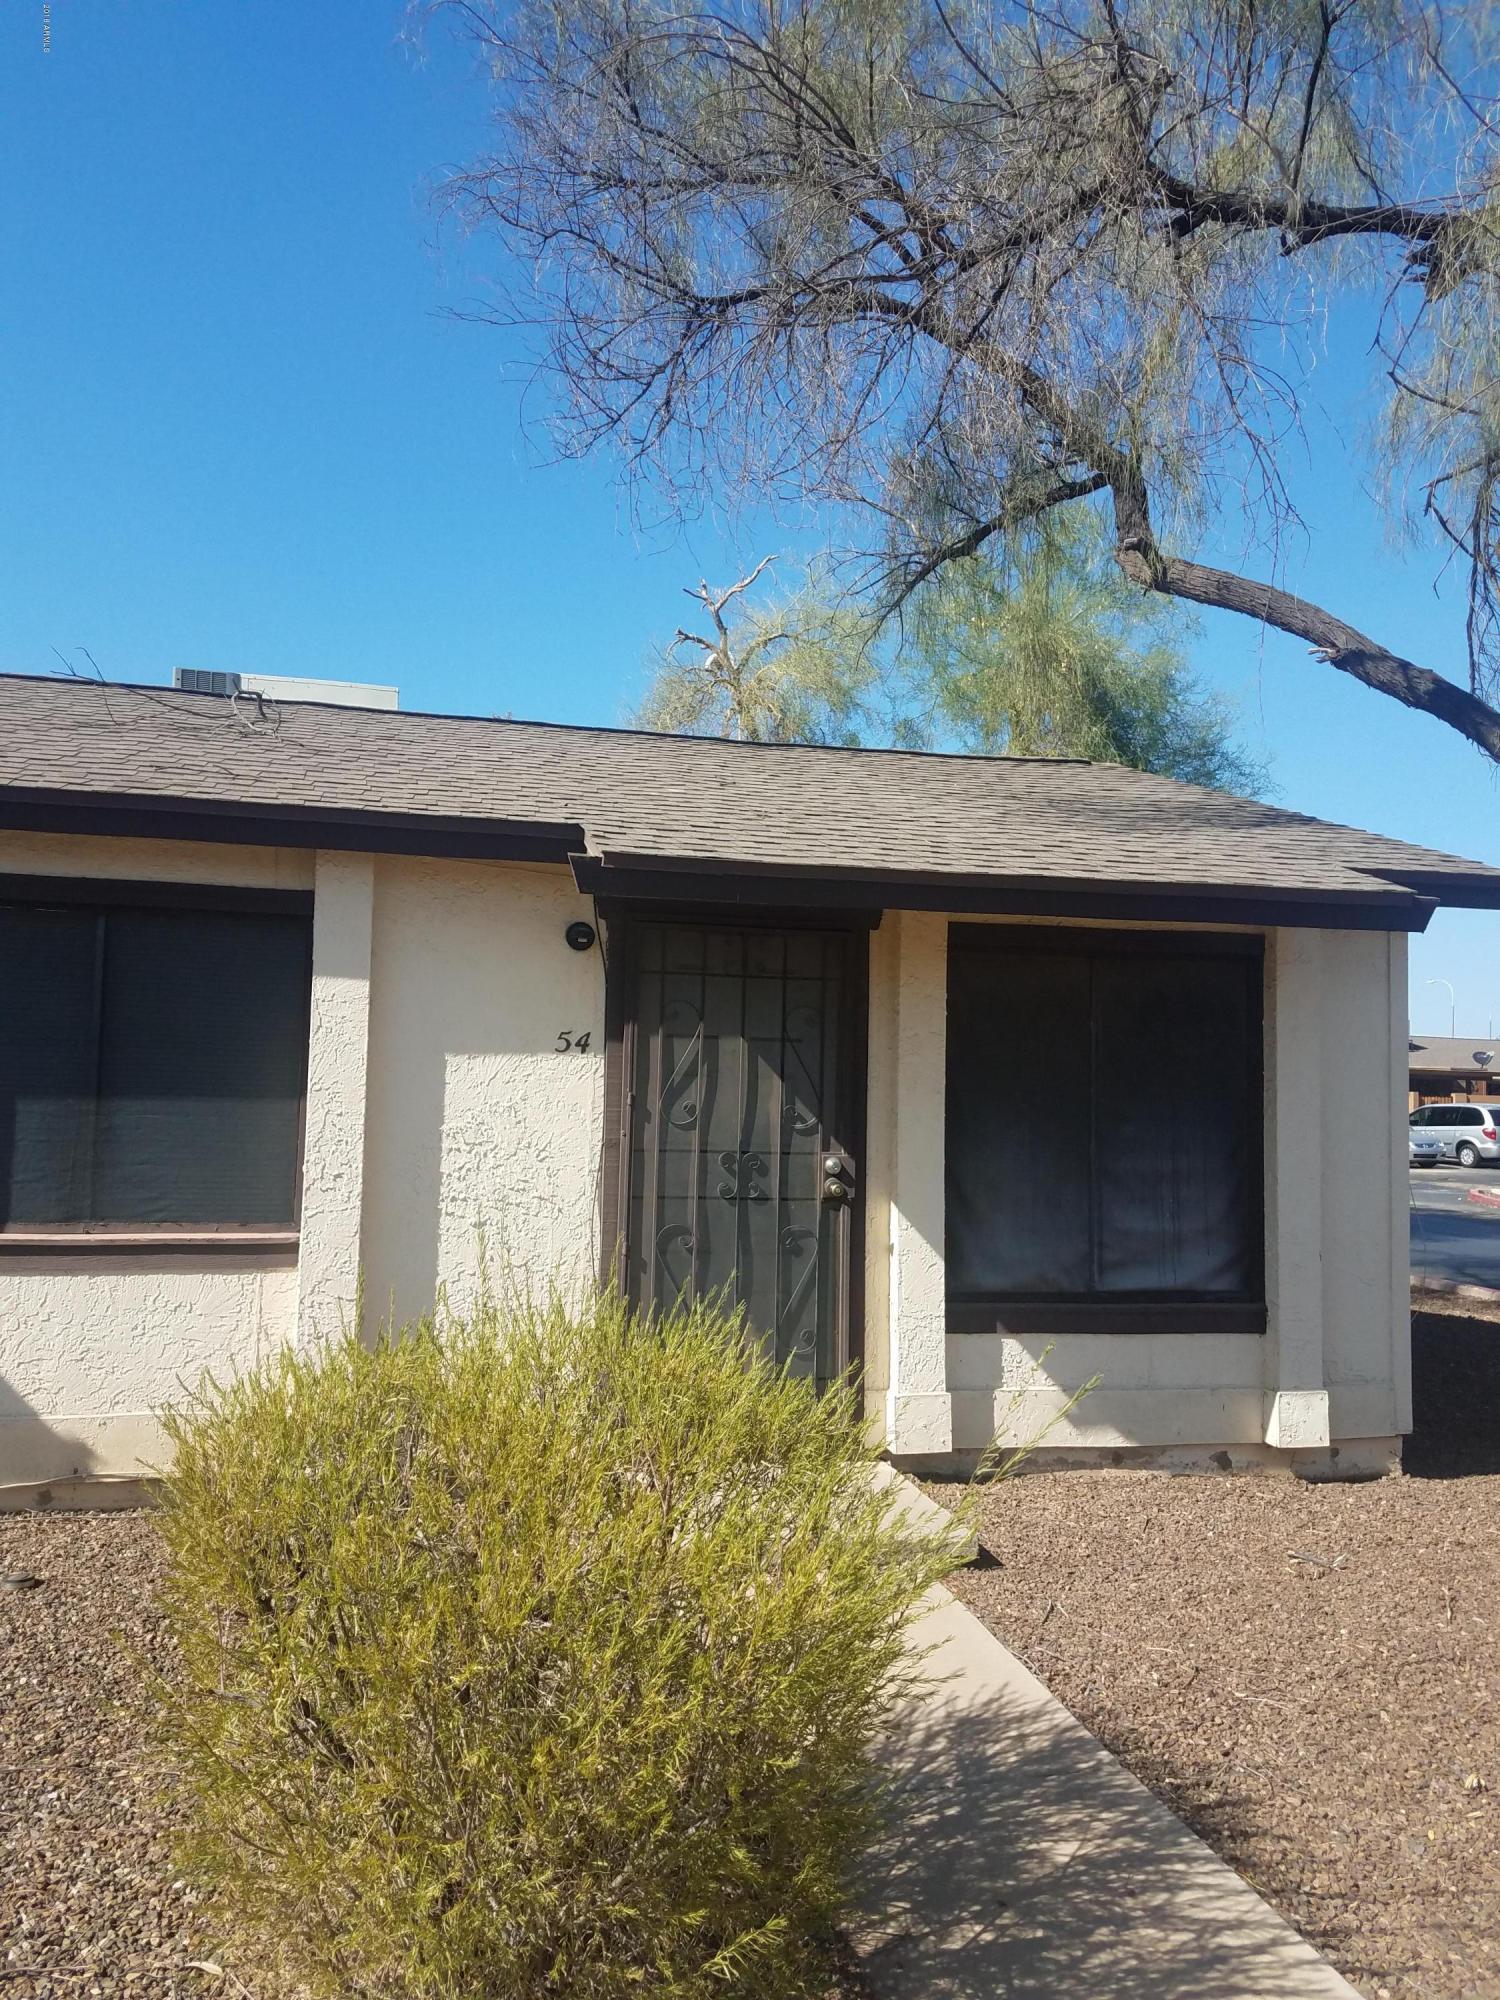 Photo of 3645 N 69TH Avenue #54, Phoenix, AZ 85033